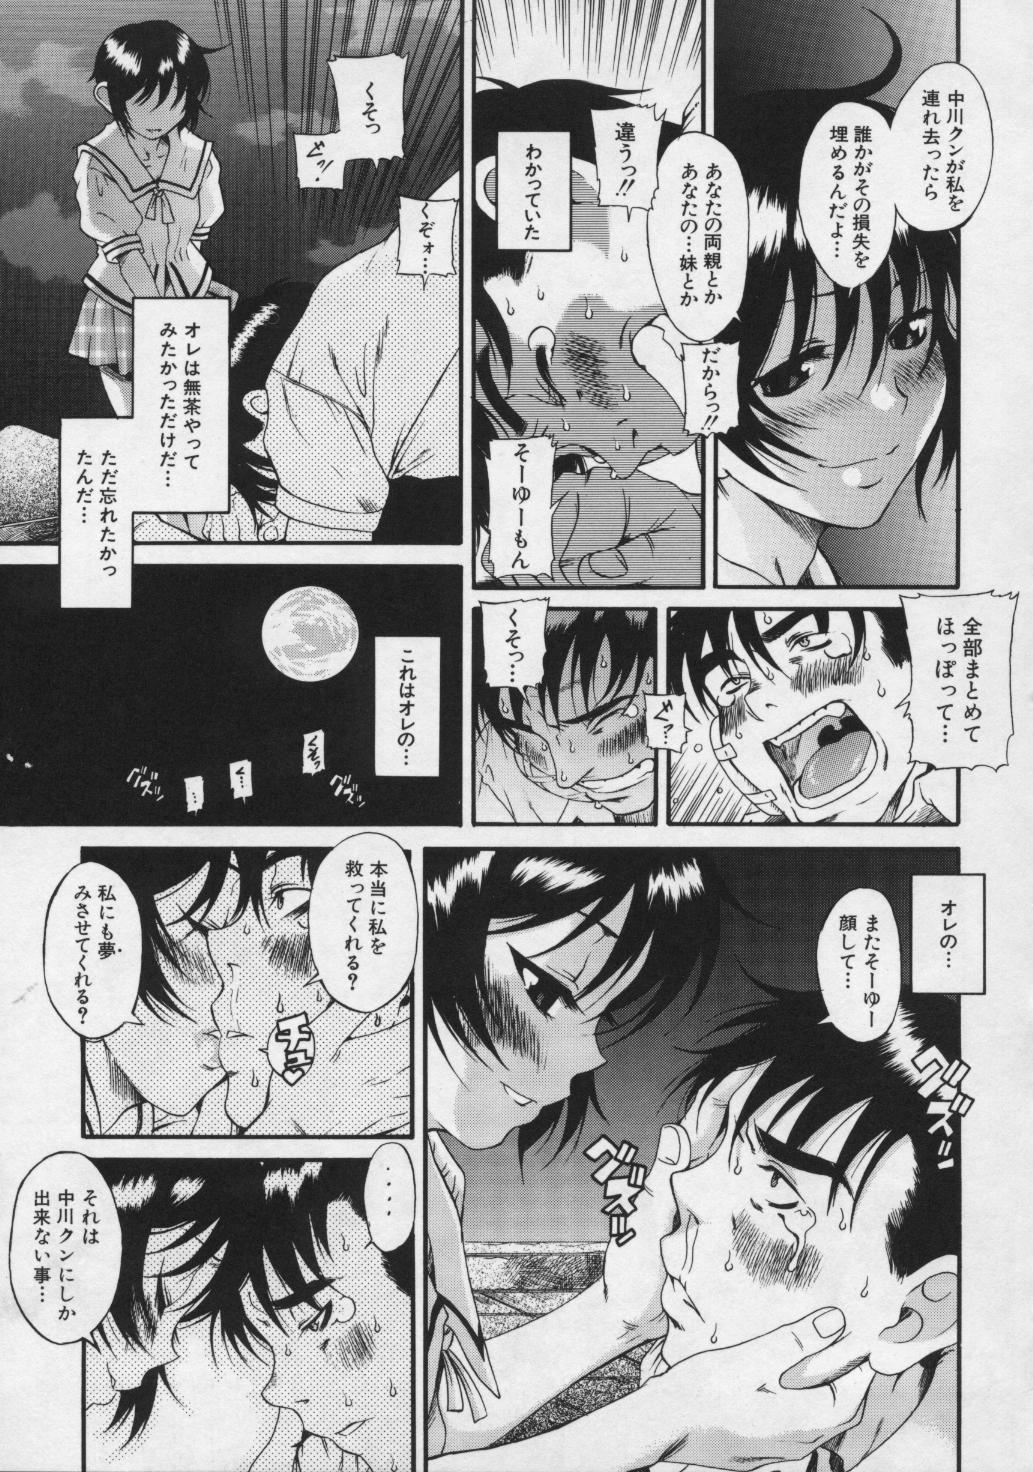 Kimi no Na o Yobeba - If I call your name. 84